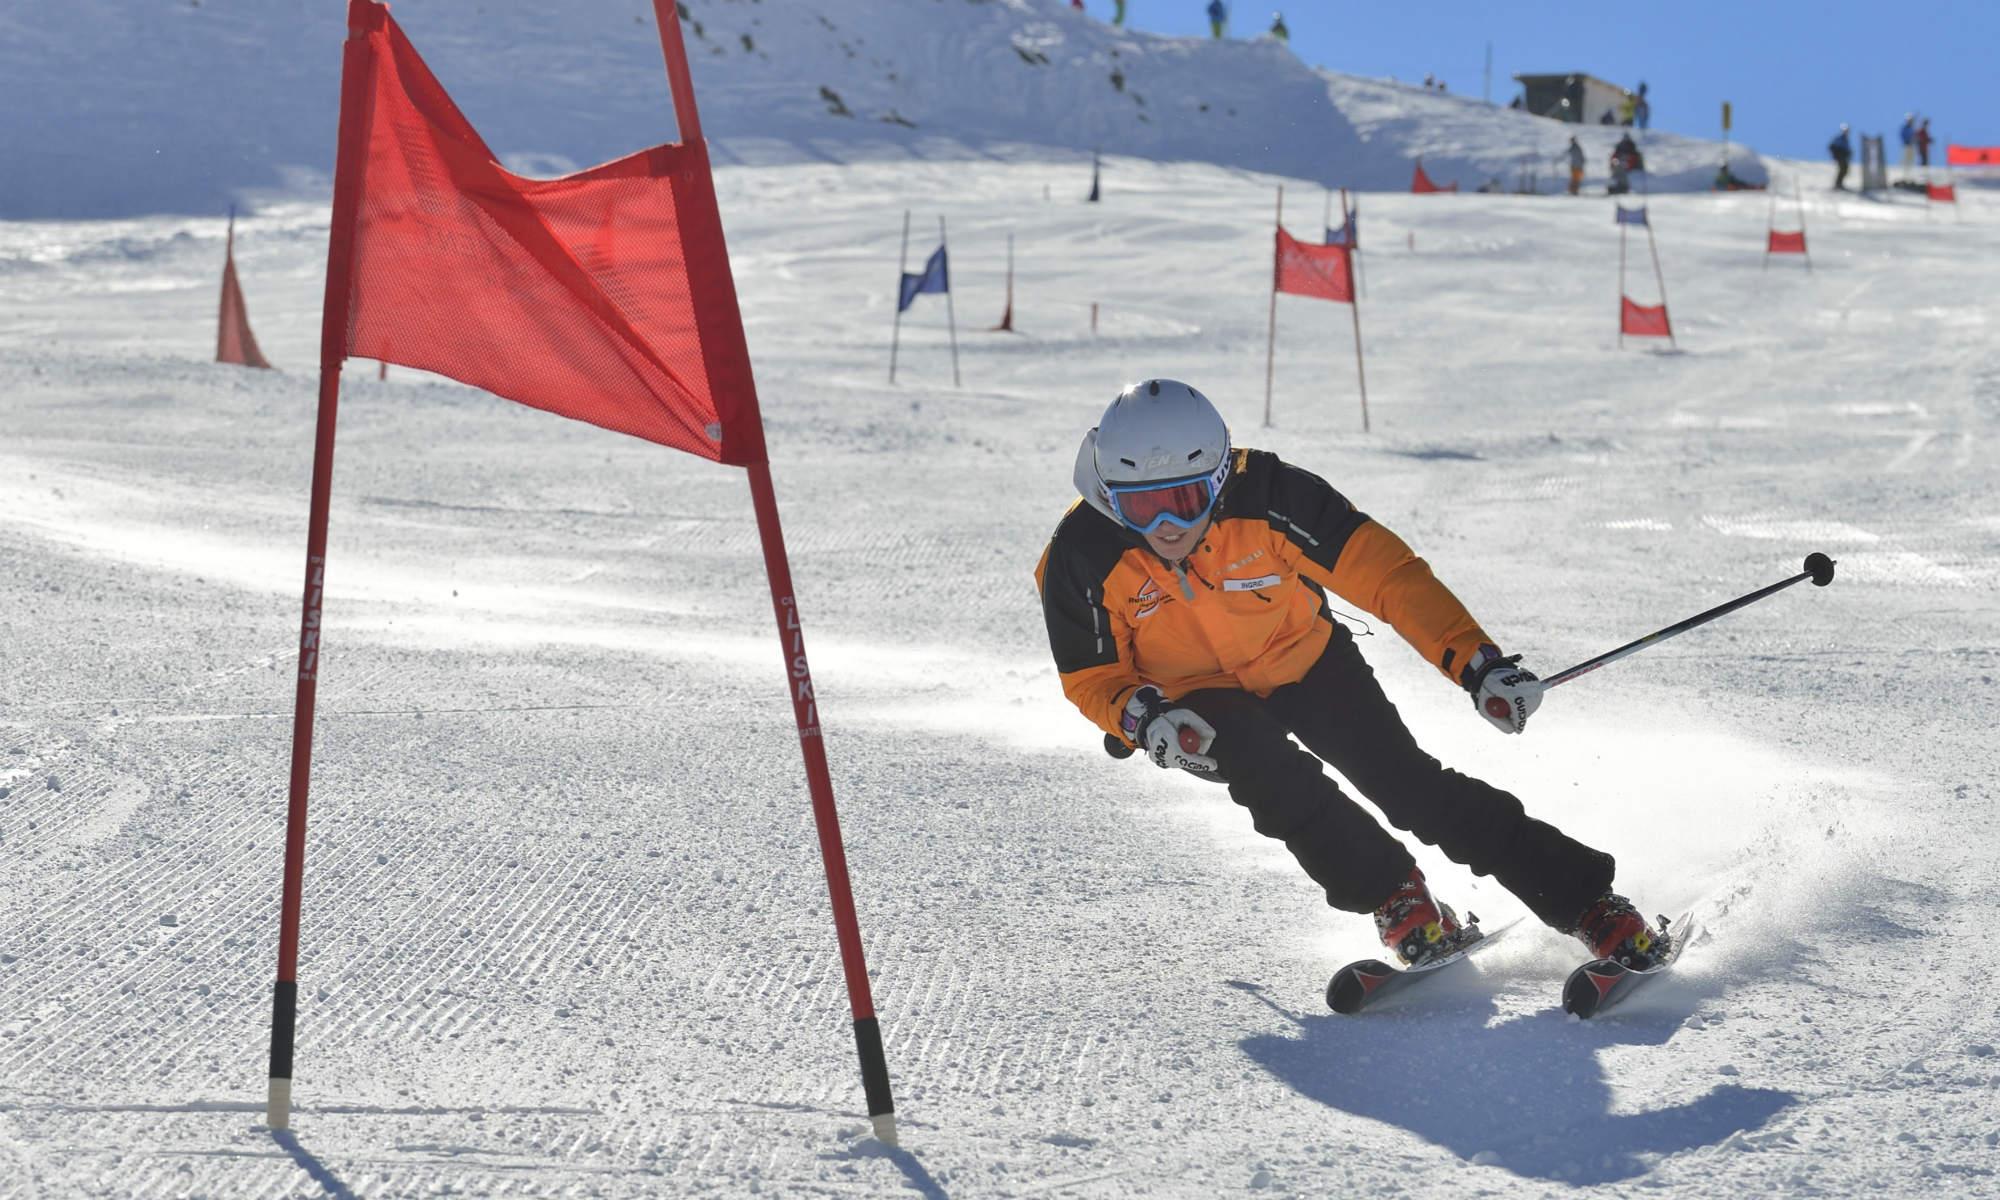 Ski racer Ingrid Salvenmoser demonstrates race carving.